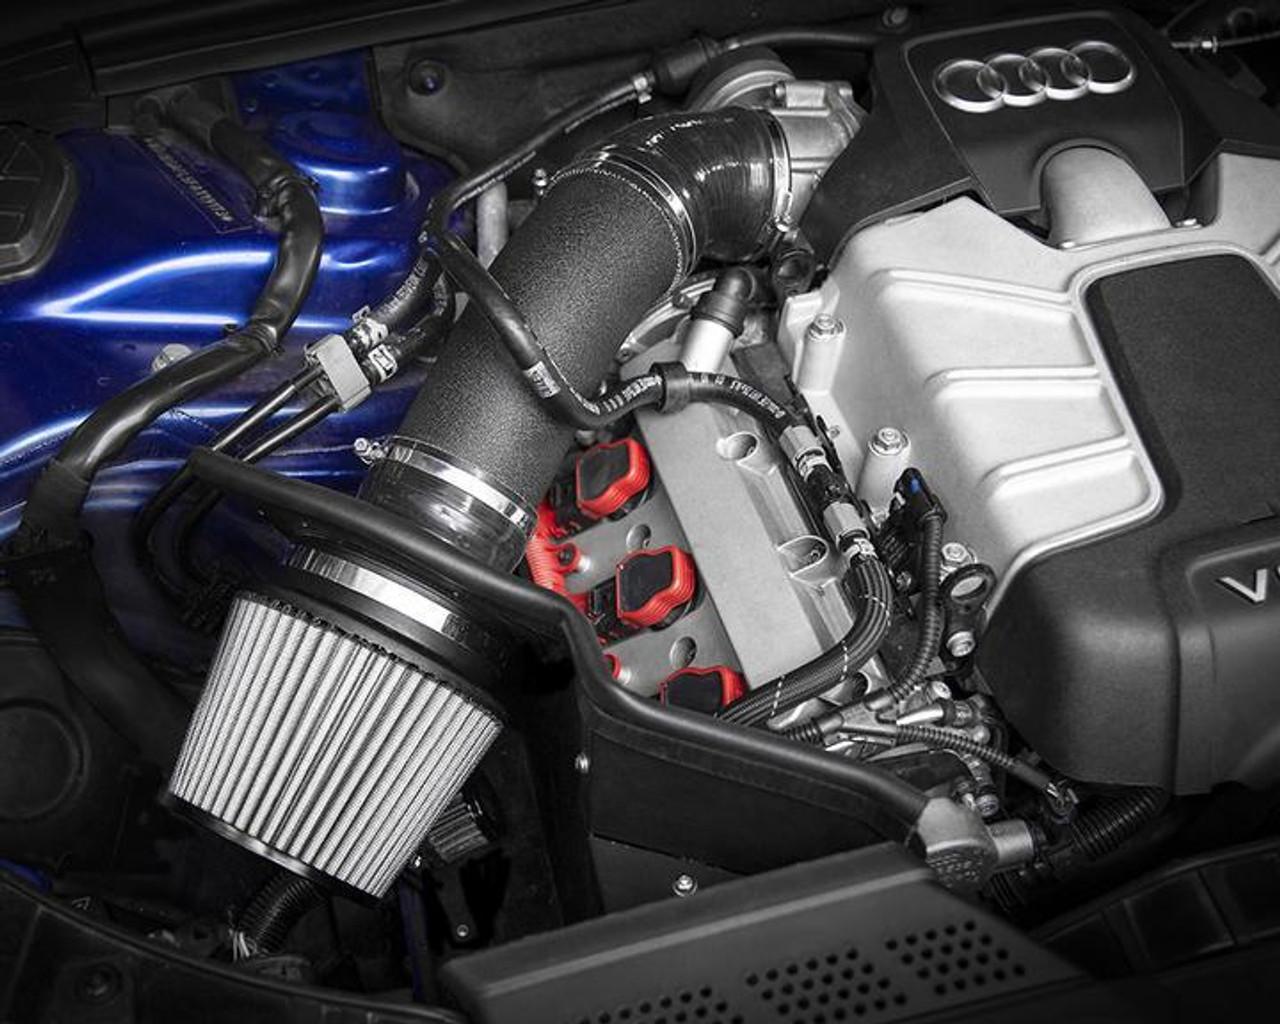 IE Audi 3.0T Cold Air Intake